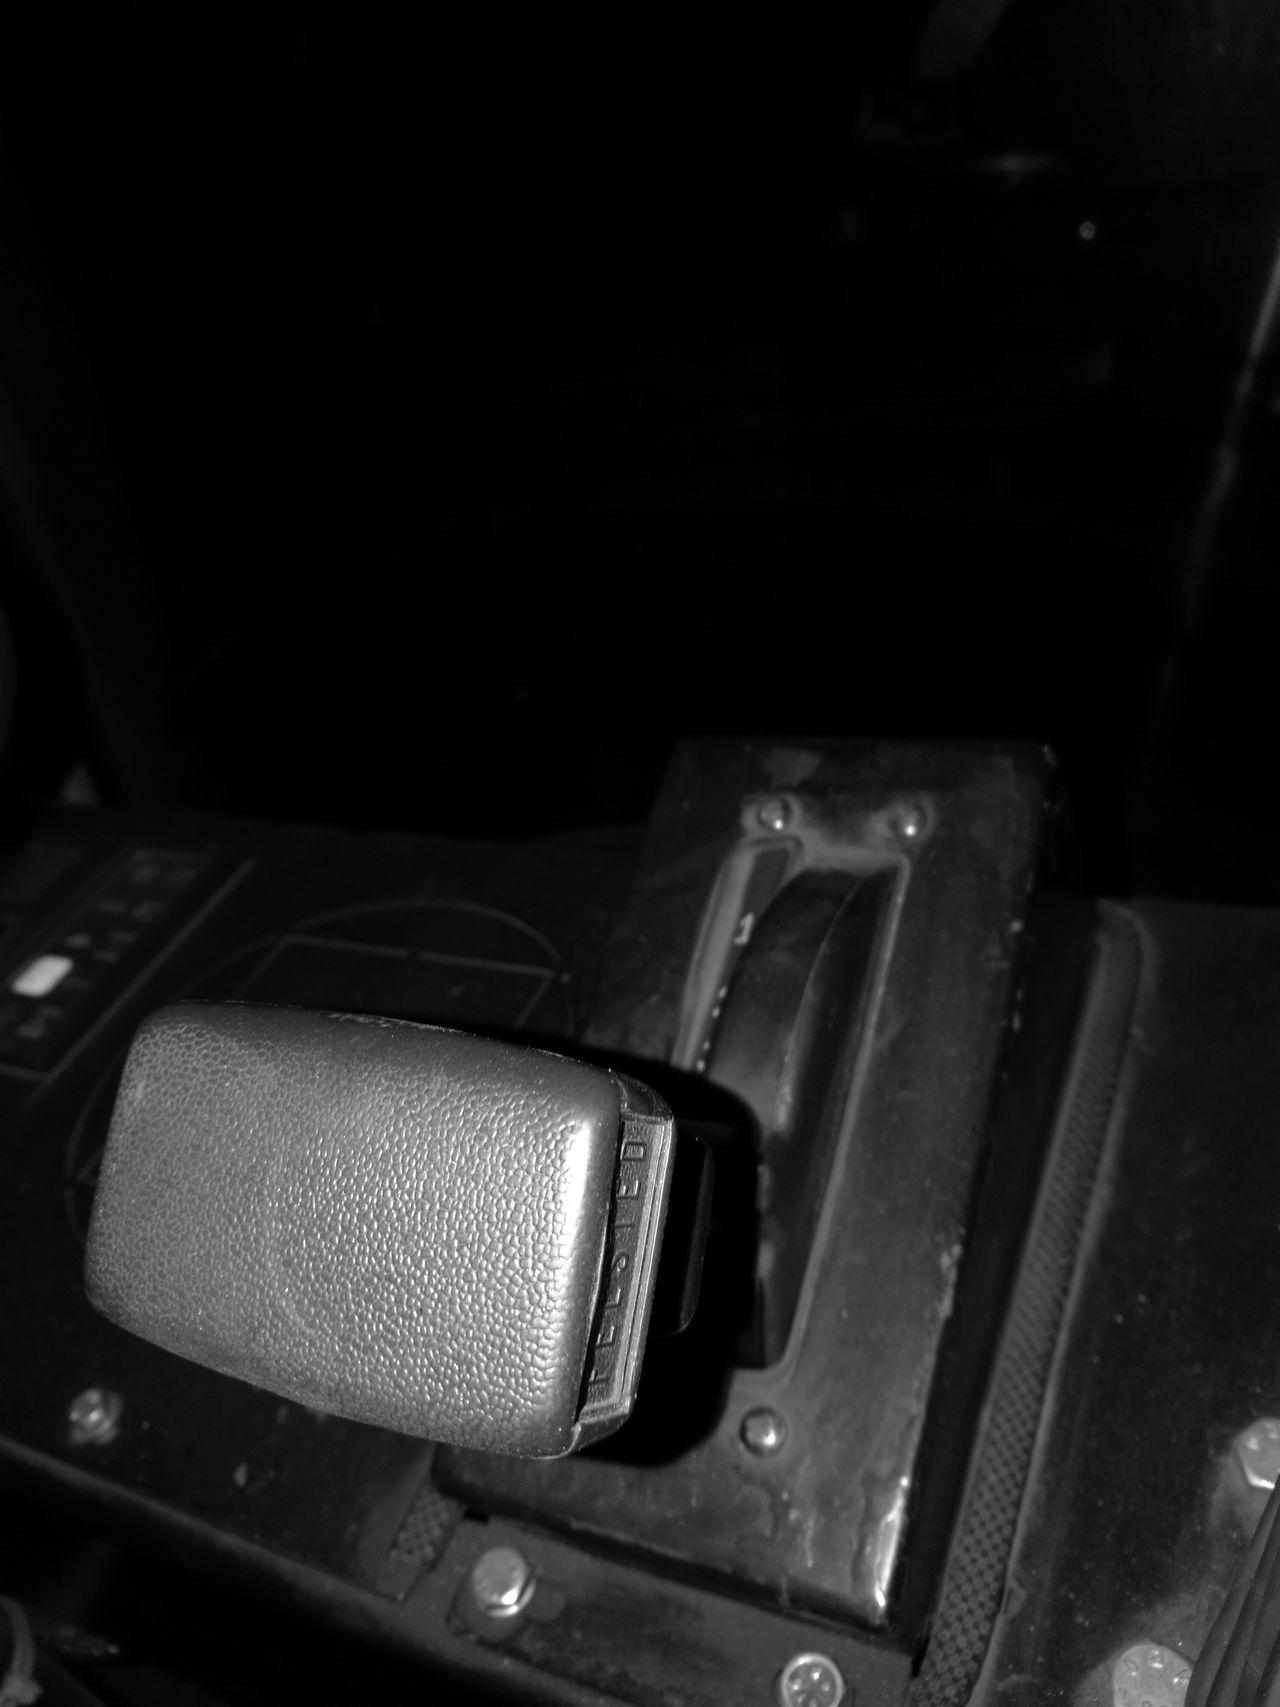 Frein Noir Et Blanc Blackandwhite Camion